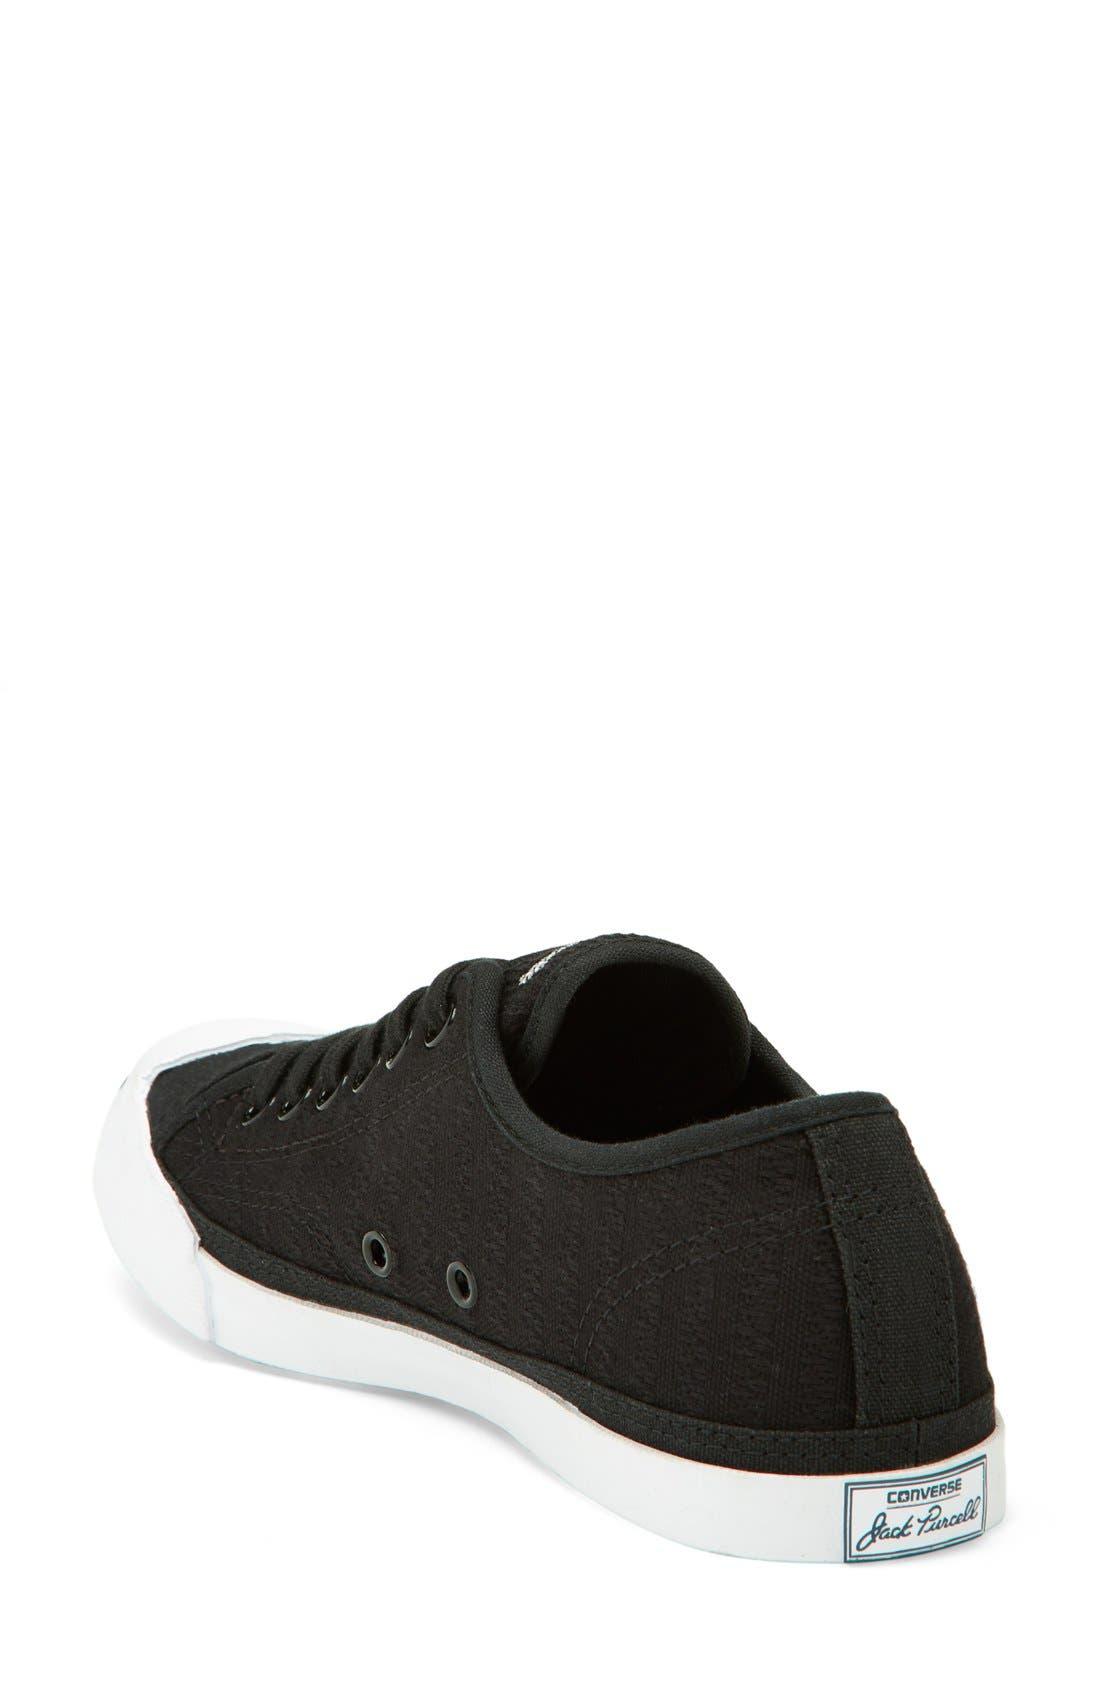 'Jack Purcell' Garment Dye Low Top Sneaker,                             Alternate thumbnail 3, color,